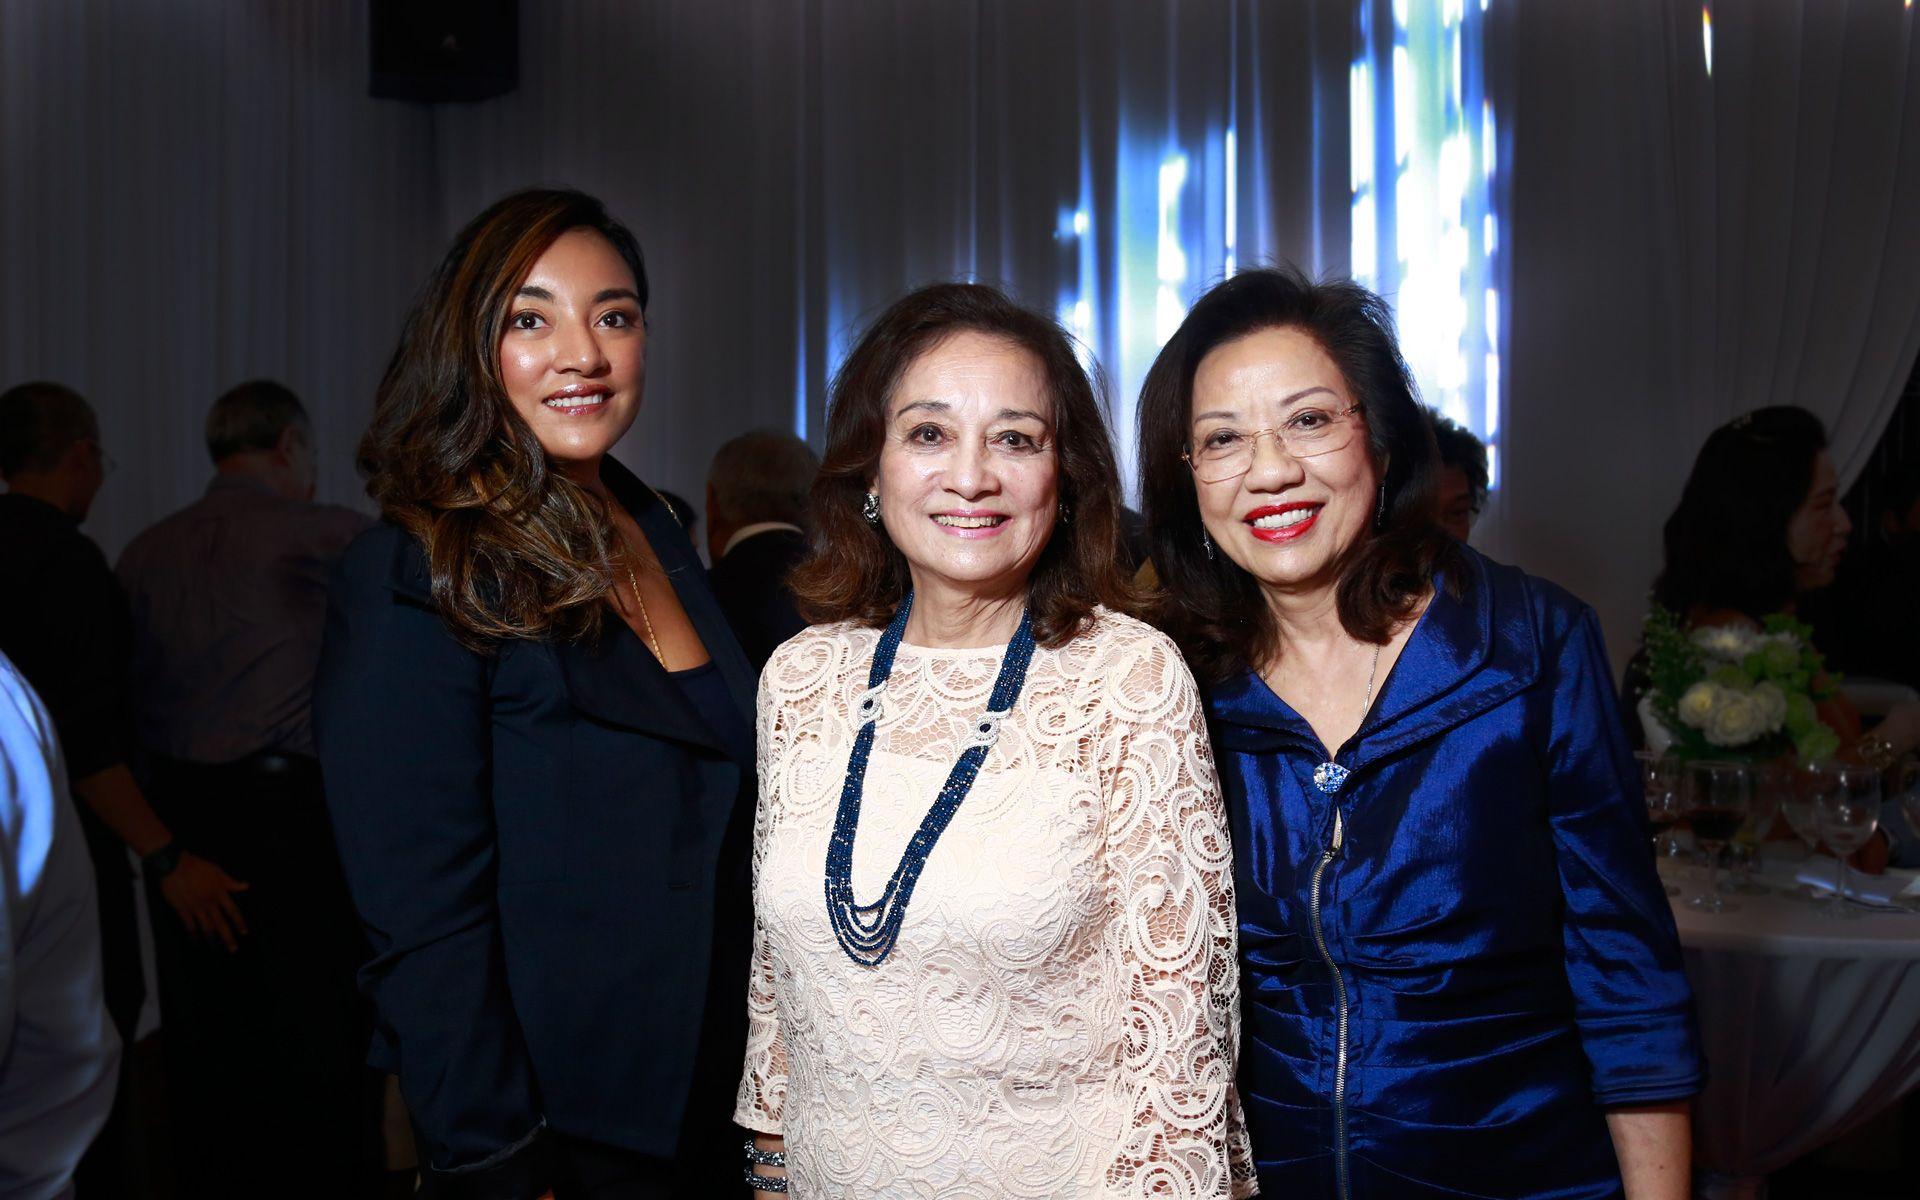 Tunku Myra Madinah, Tunku Dara Naquiah and Puan Sri Siew Yong Gnanalingam